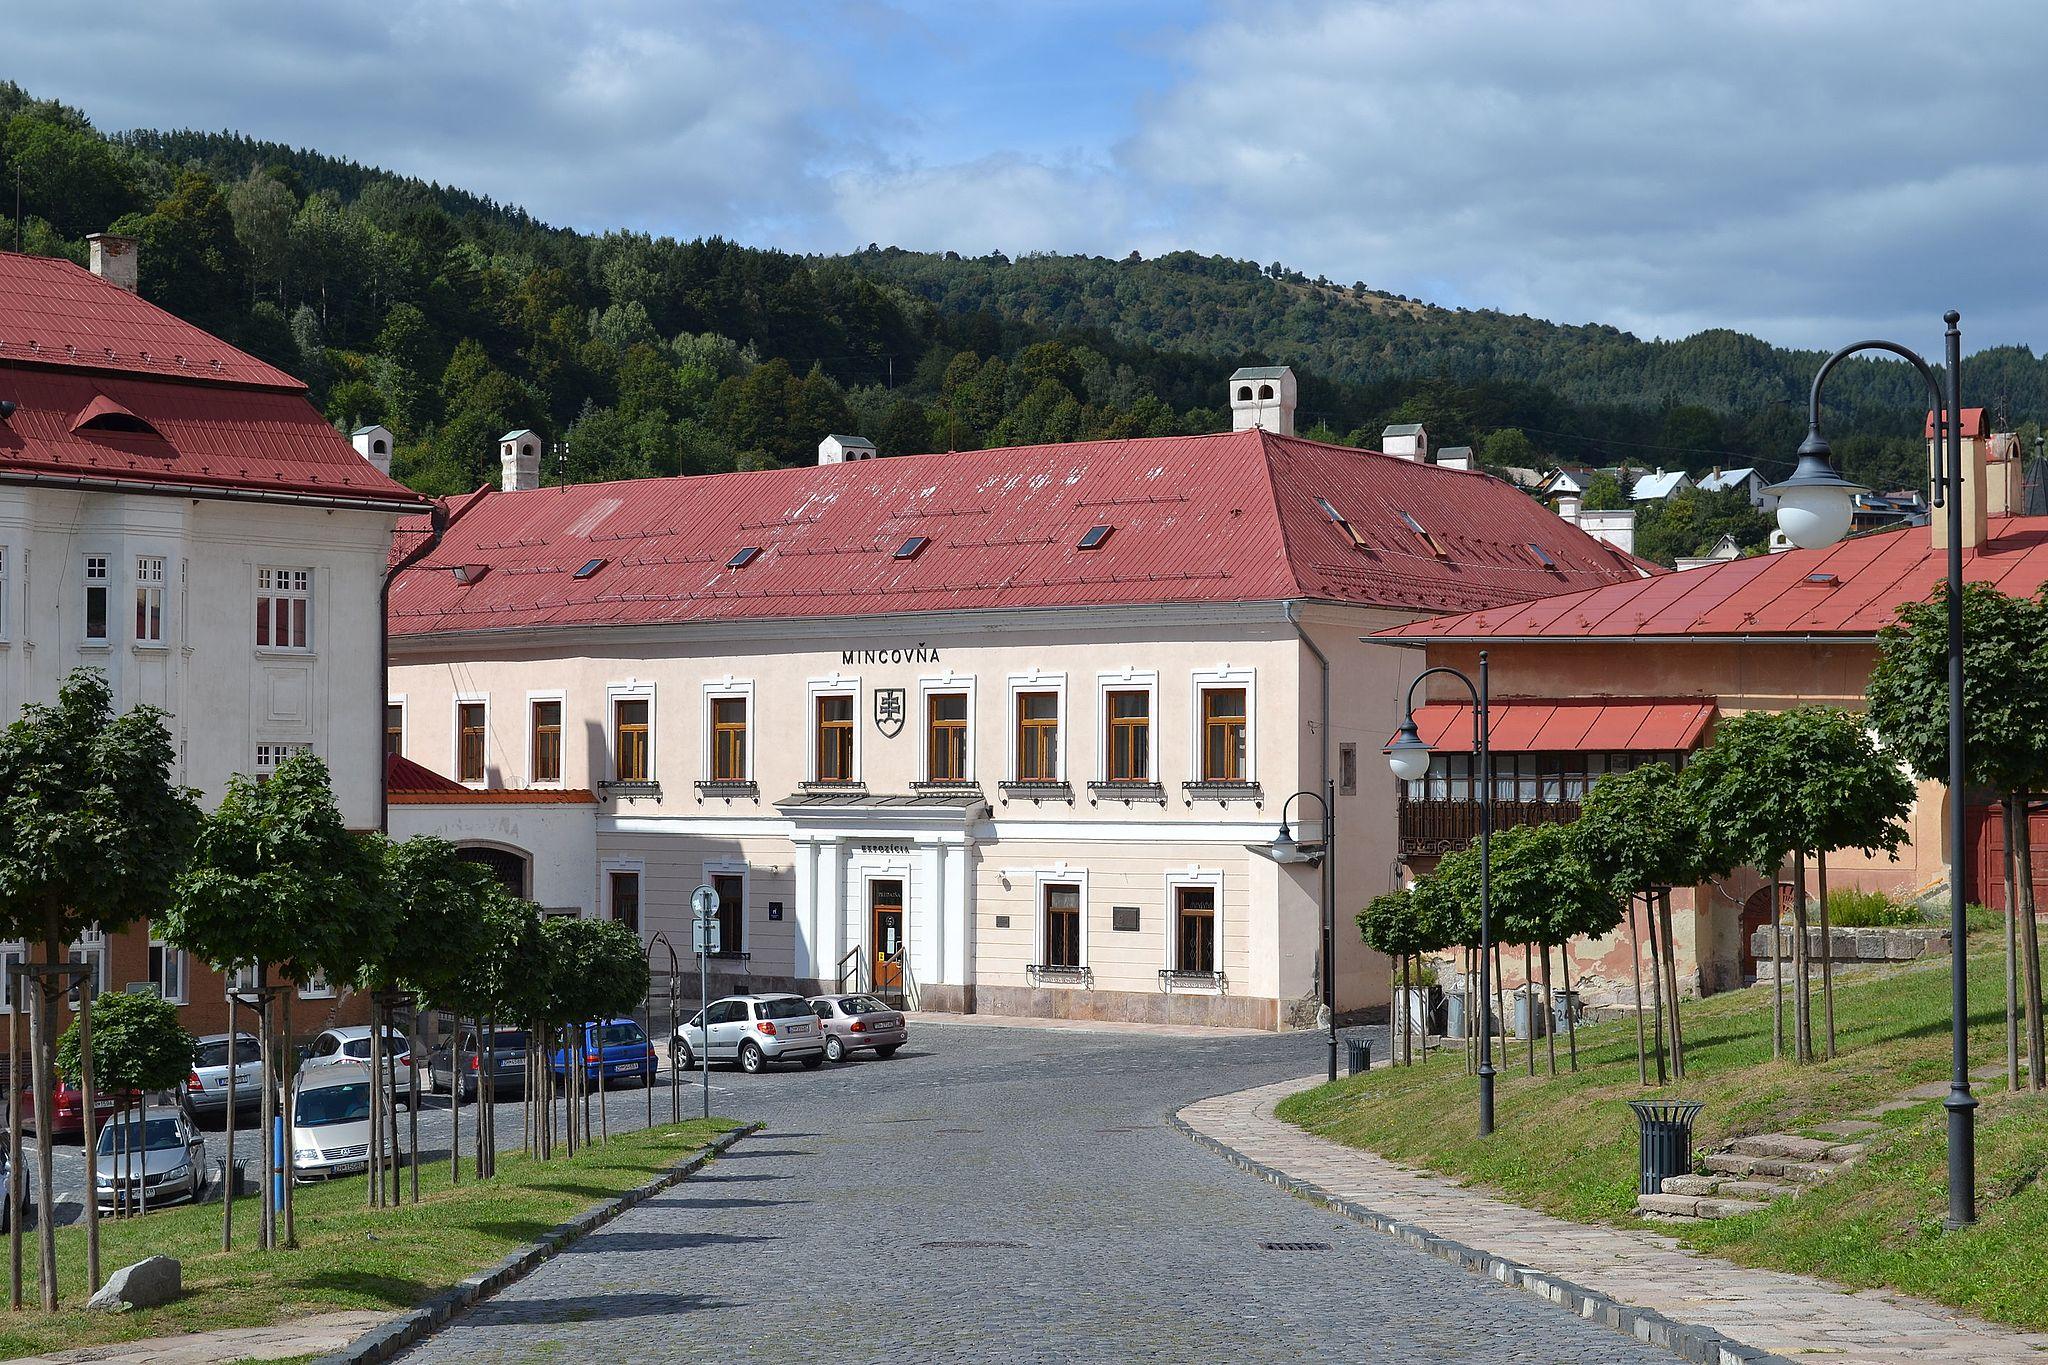 Zdroj: Wikimedia Commons, Autor: Ladislav Luppa